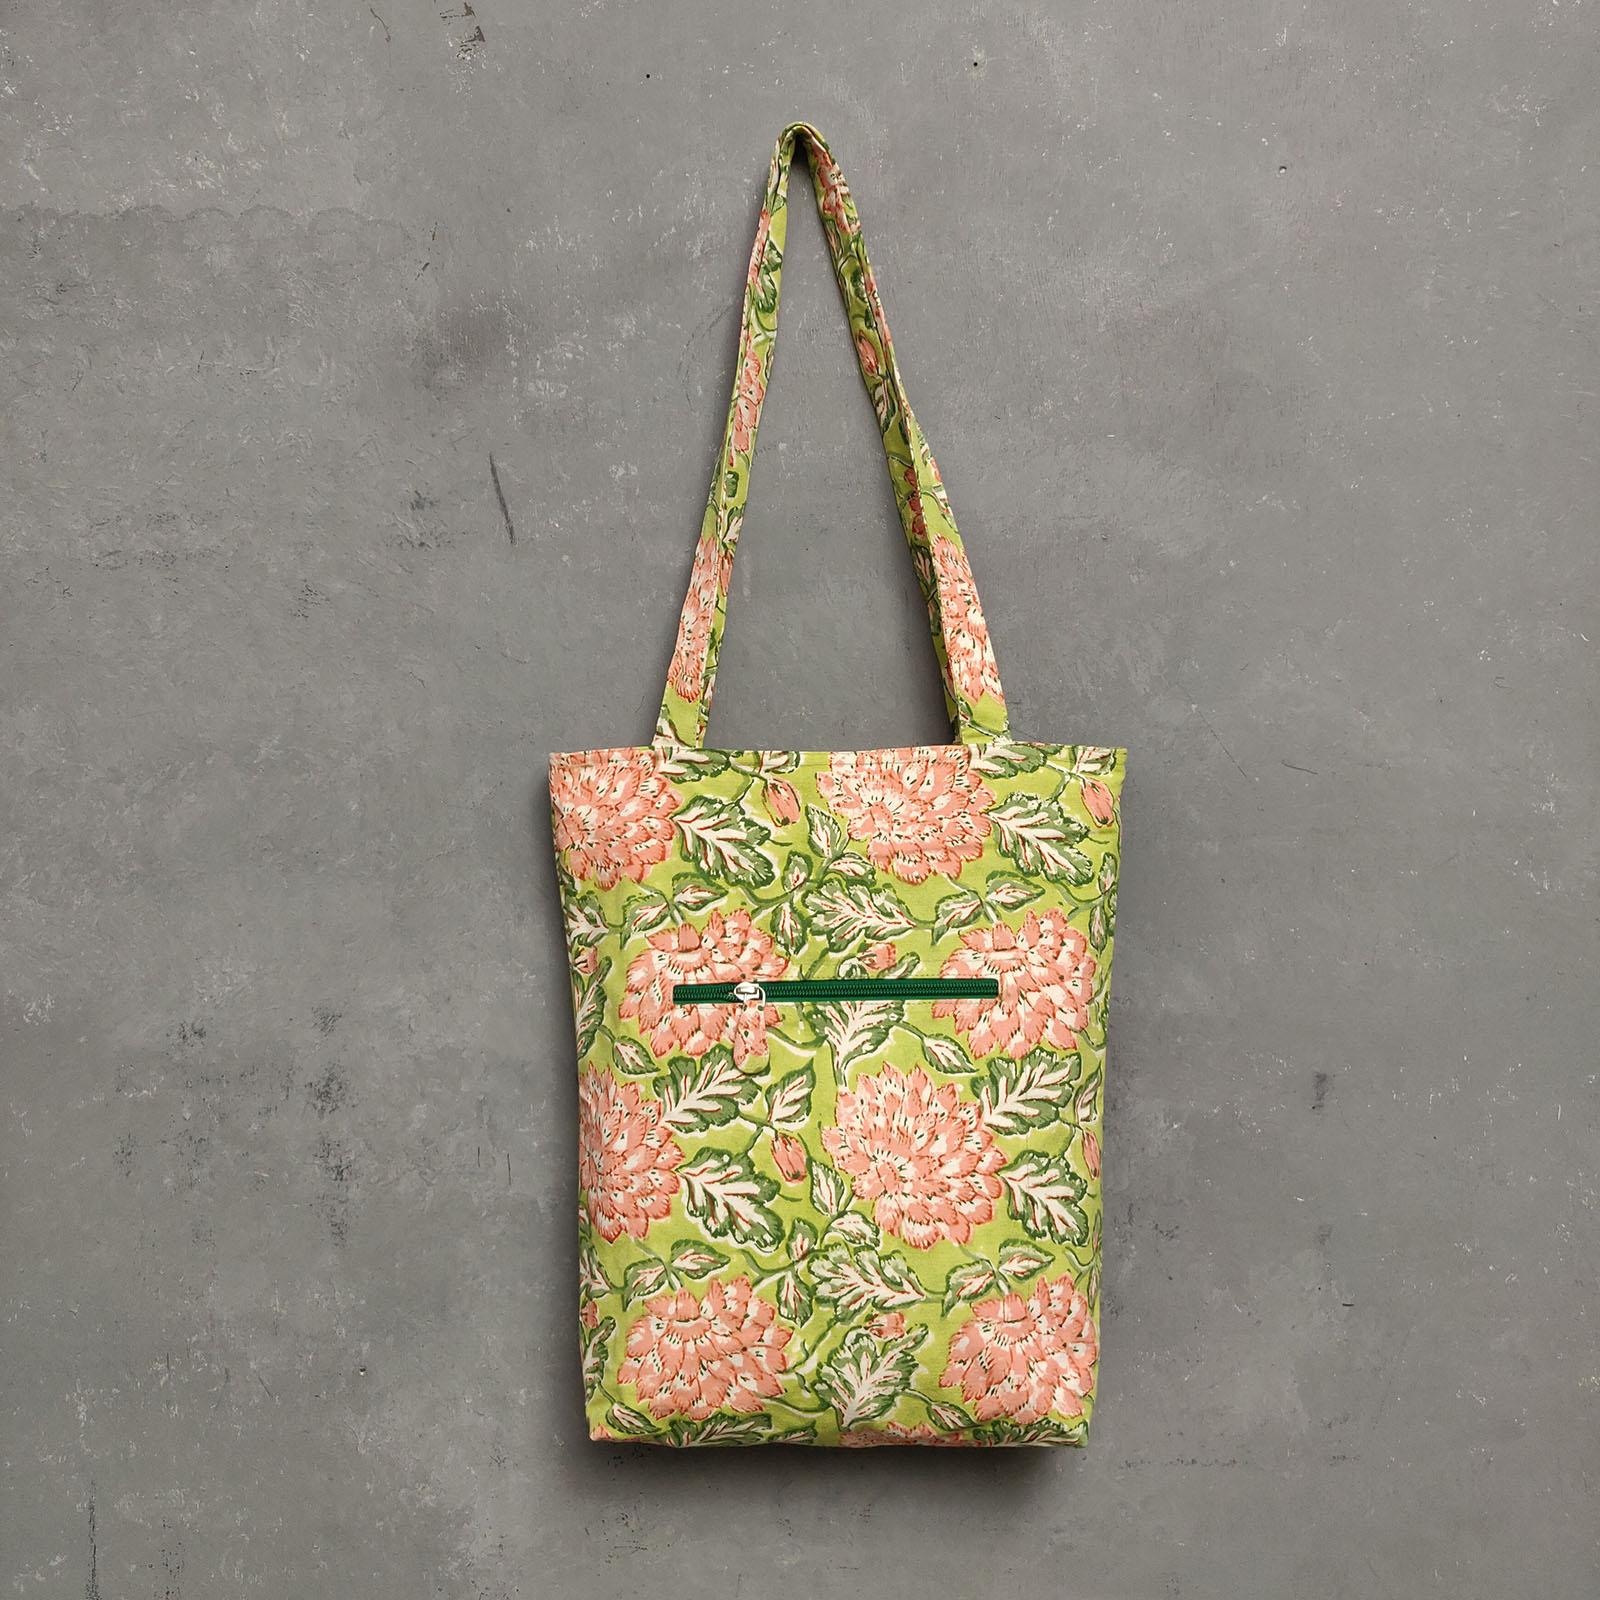 Handblock Printed Medium Canvas Tote Bag MCTB22